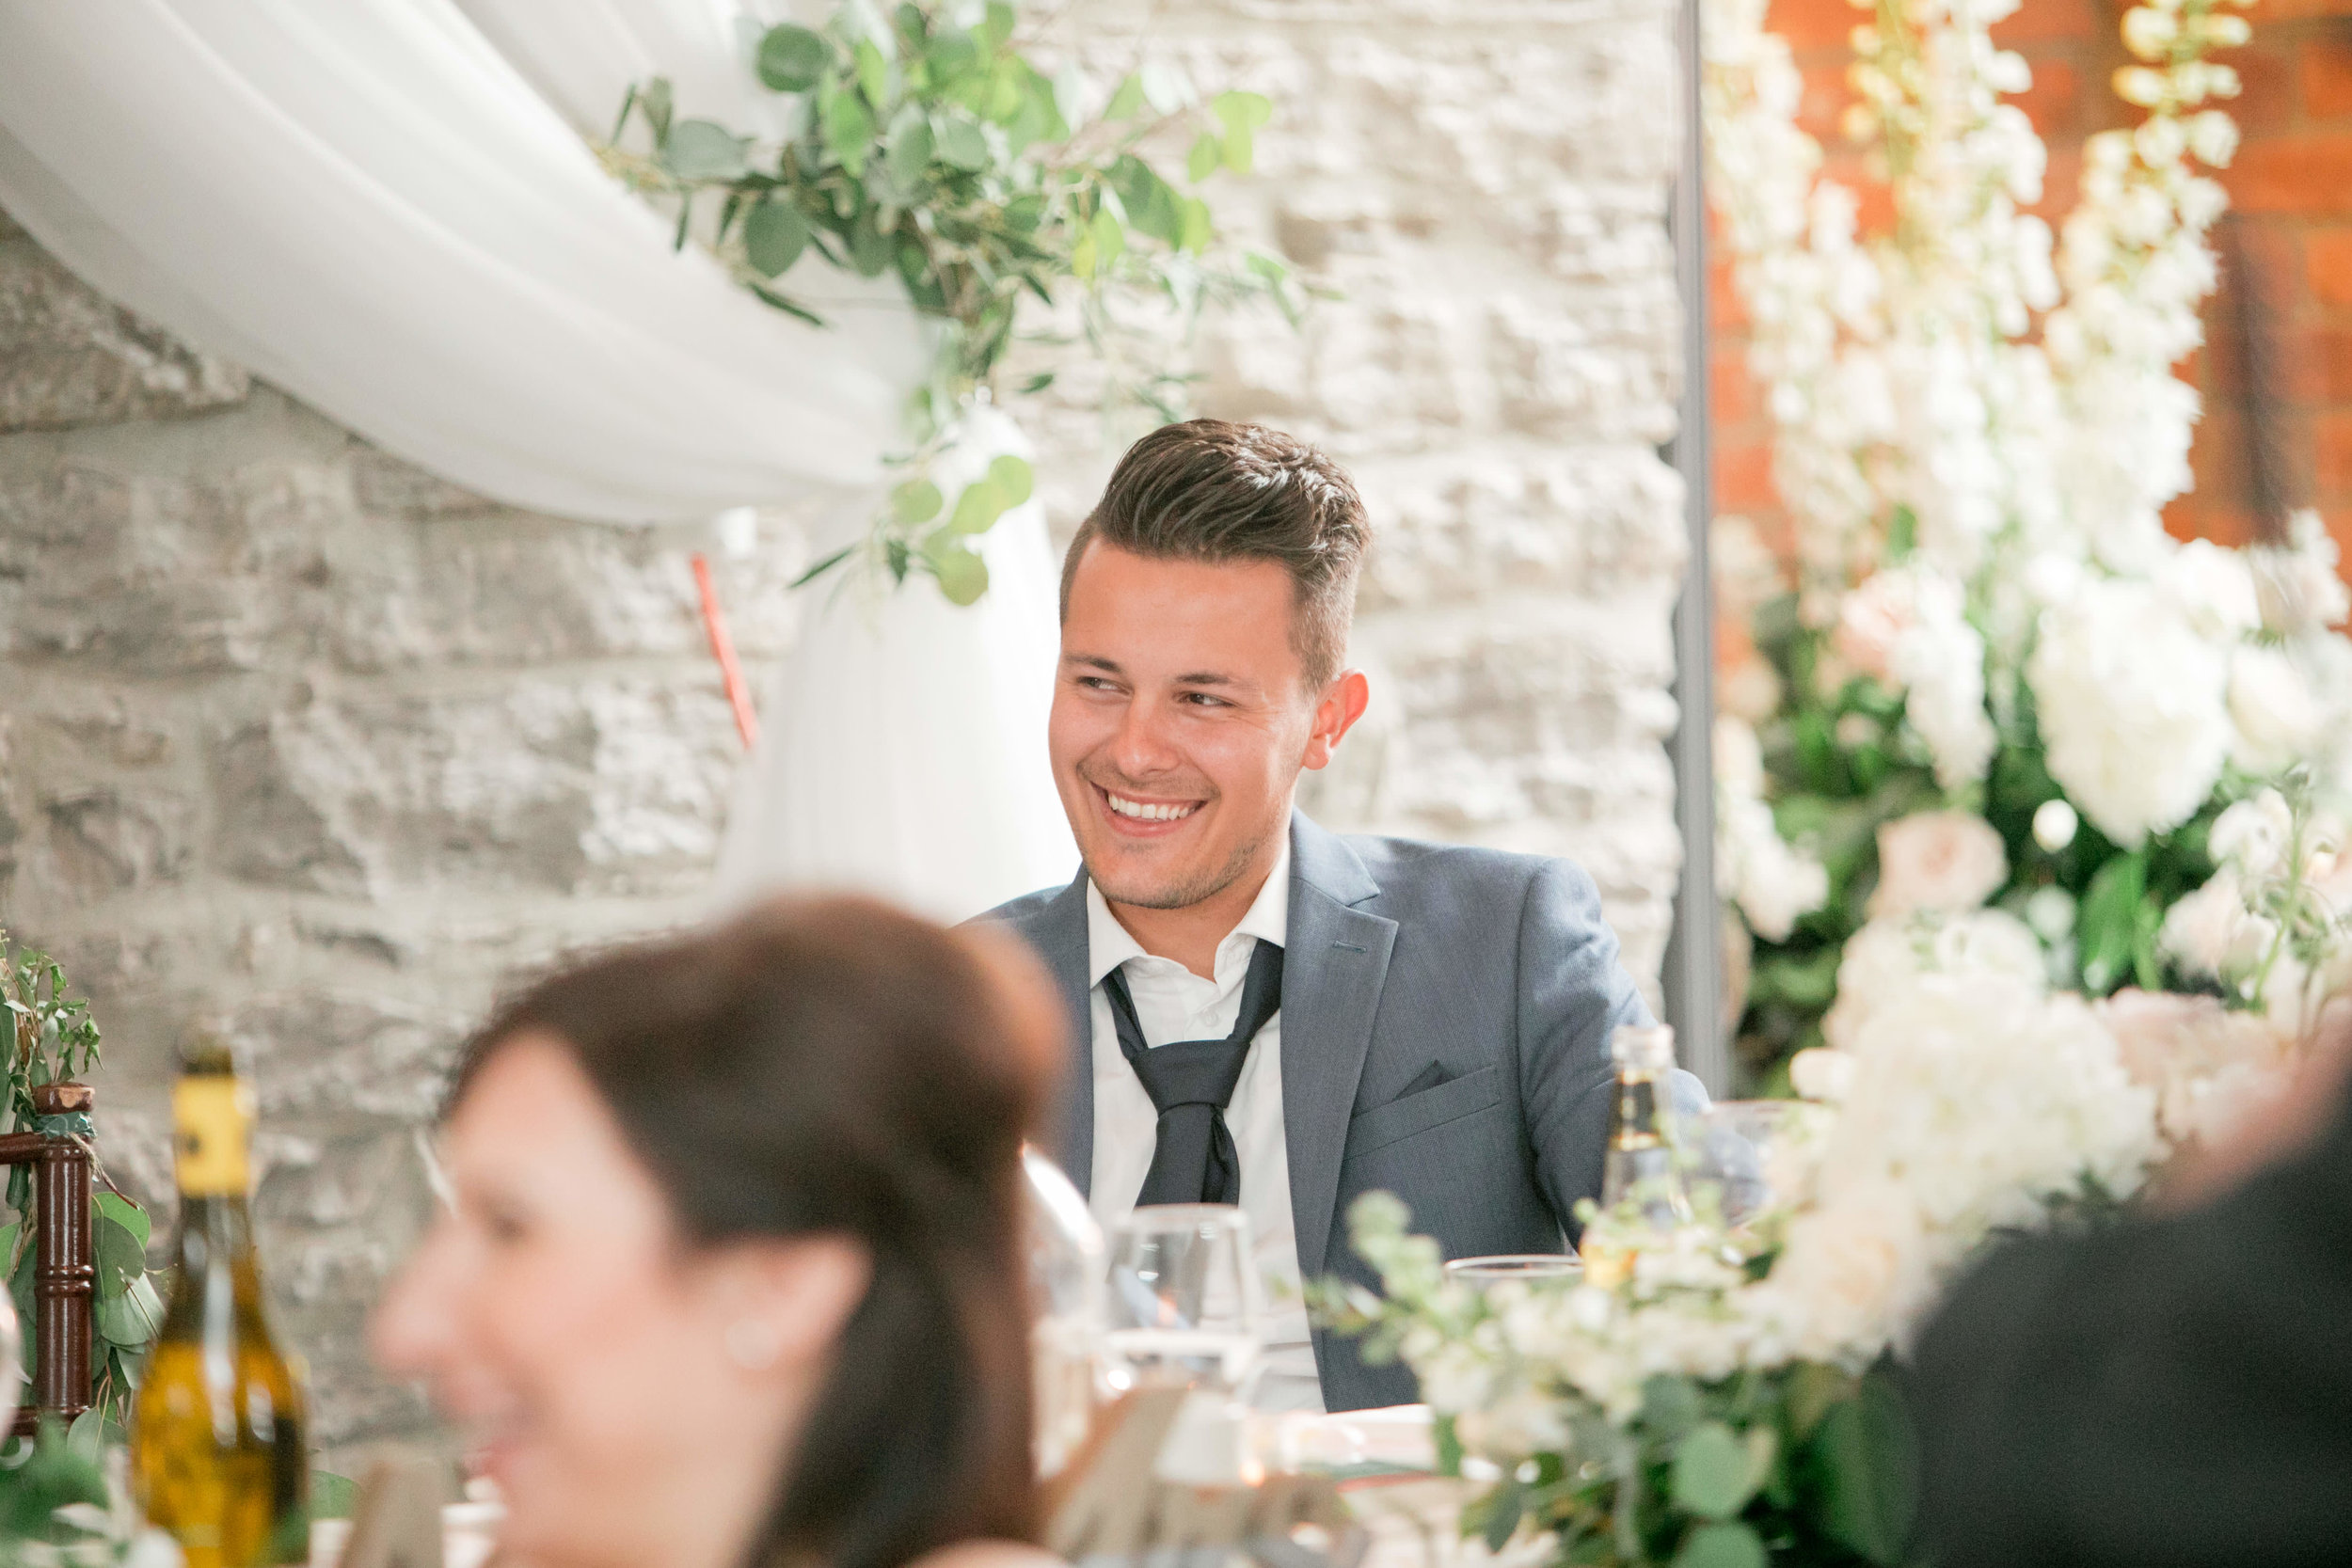 Miranda___Daniel___Daniel_Ricci_Weddings___High_Res._Finals_674.jpg